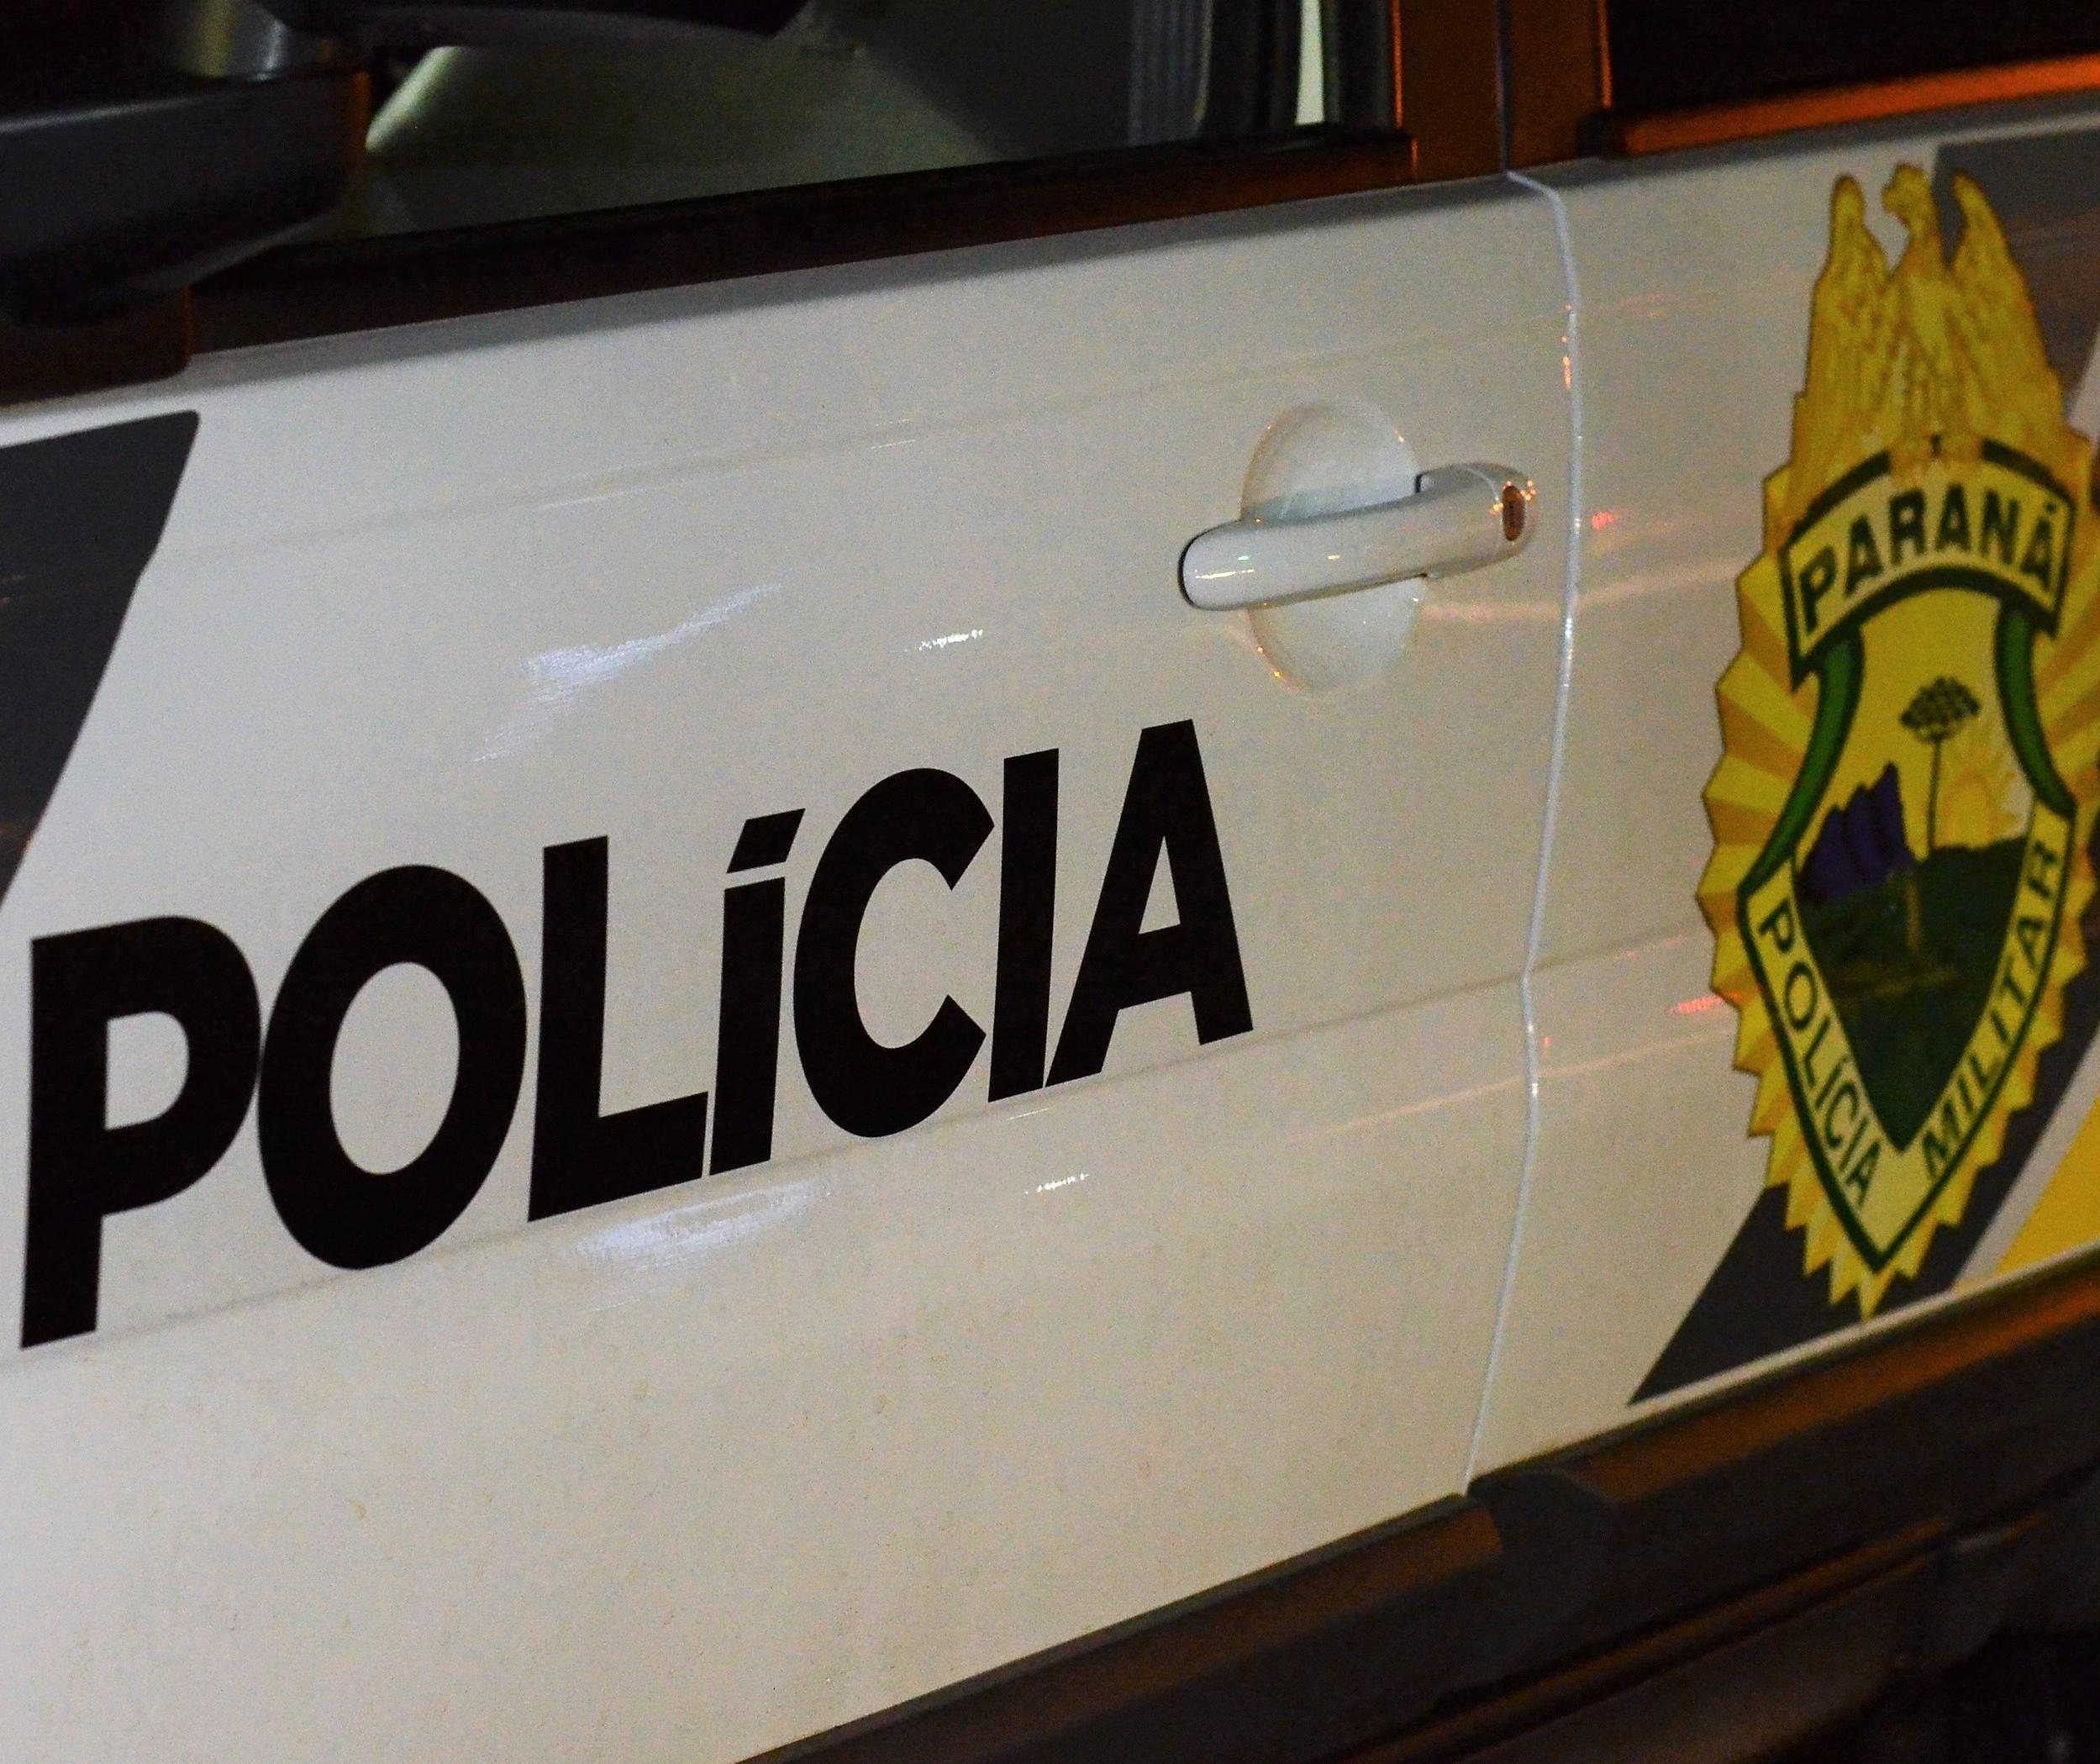 Polícia identifica o suspeito do crime